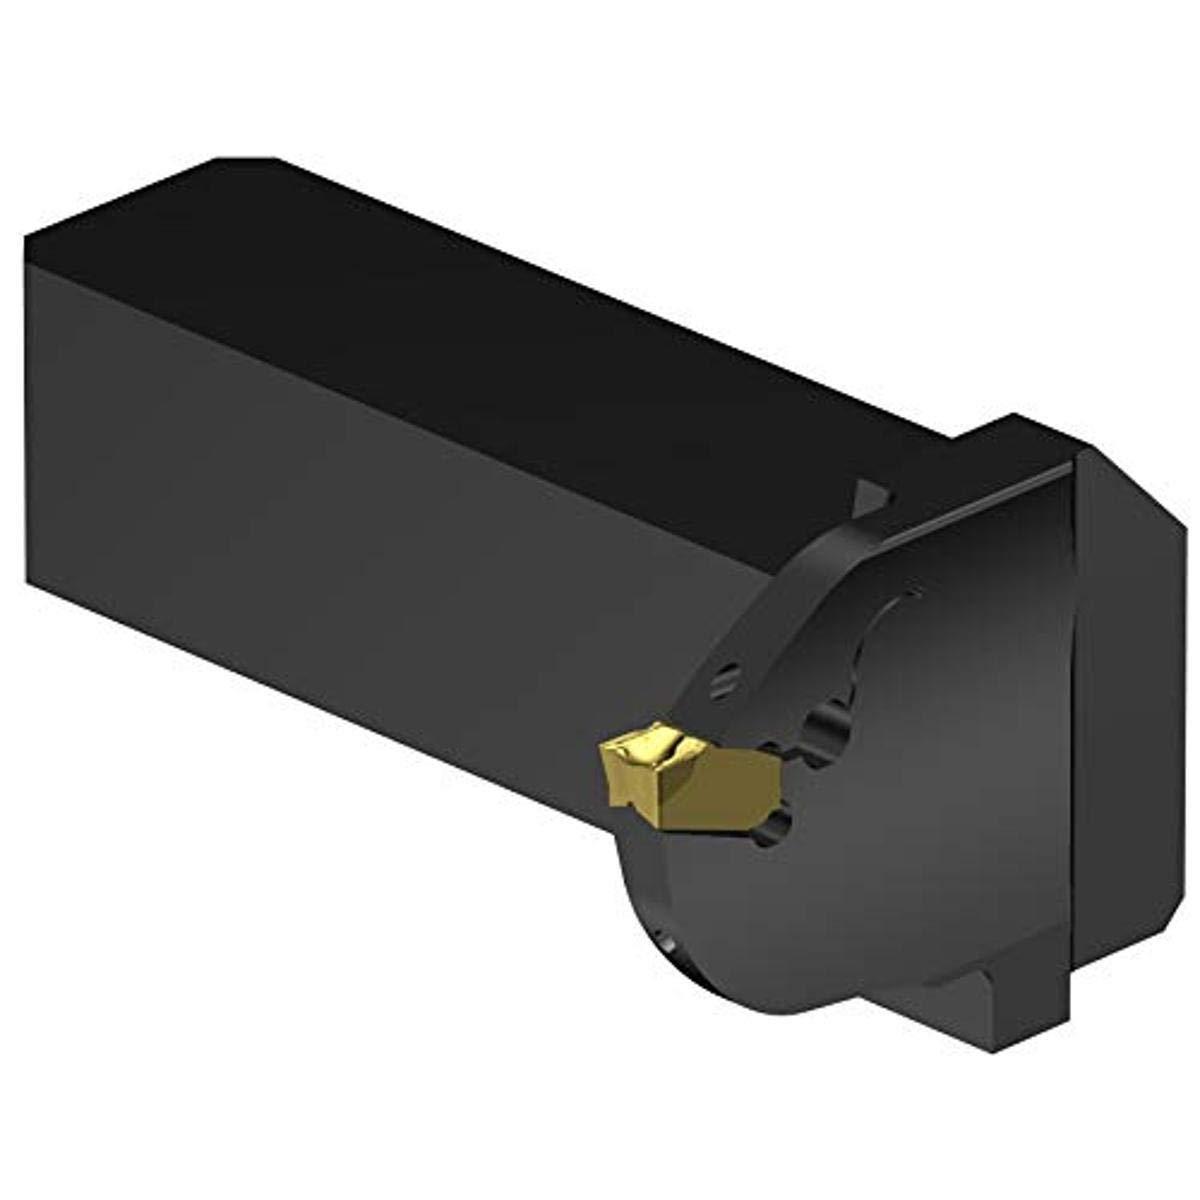 Left Hand QFT-LGK26C2525-045B Sandvik Coromant Internal Coolant Coro Cut QF QS Shank Tool for face Grooving